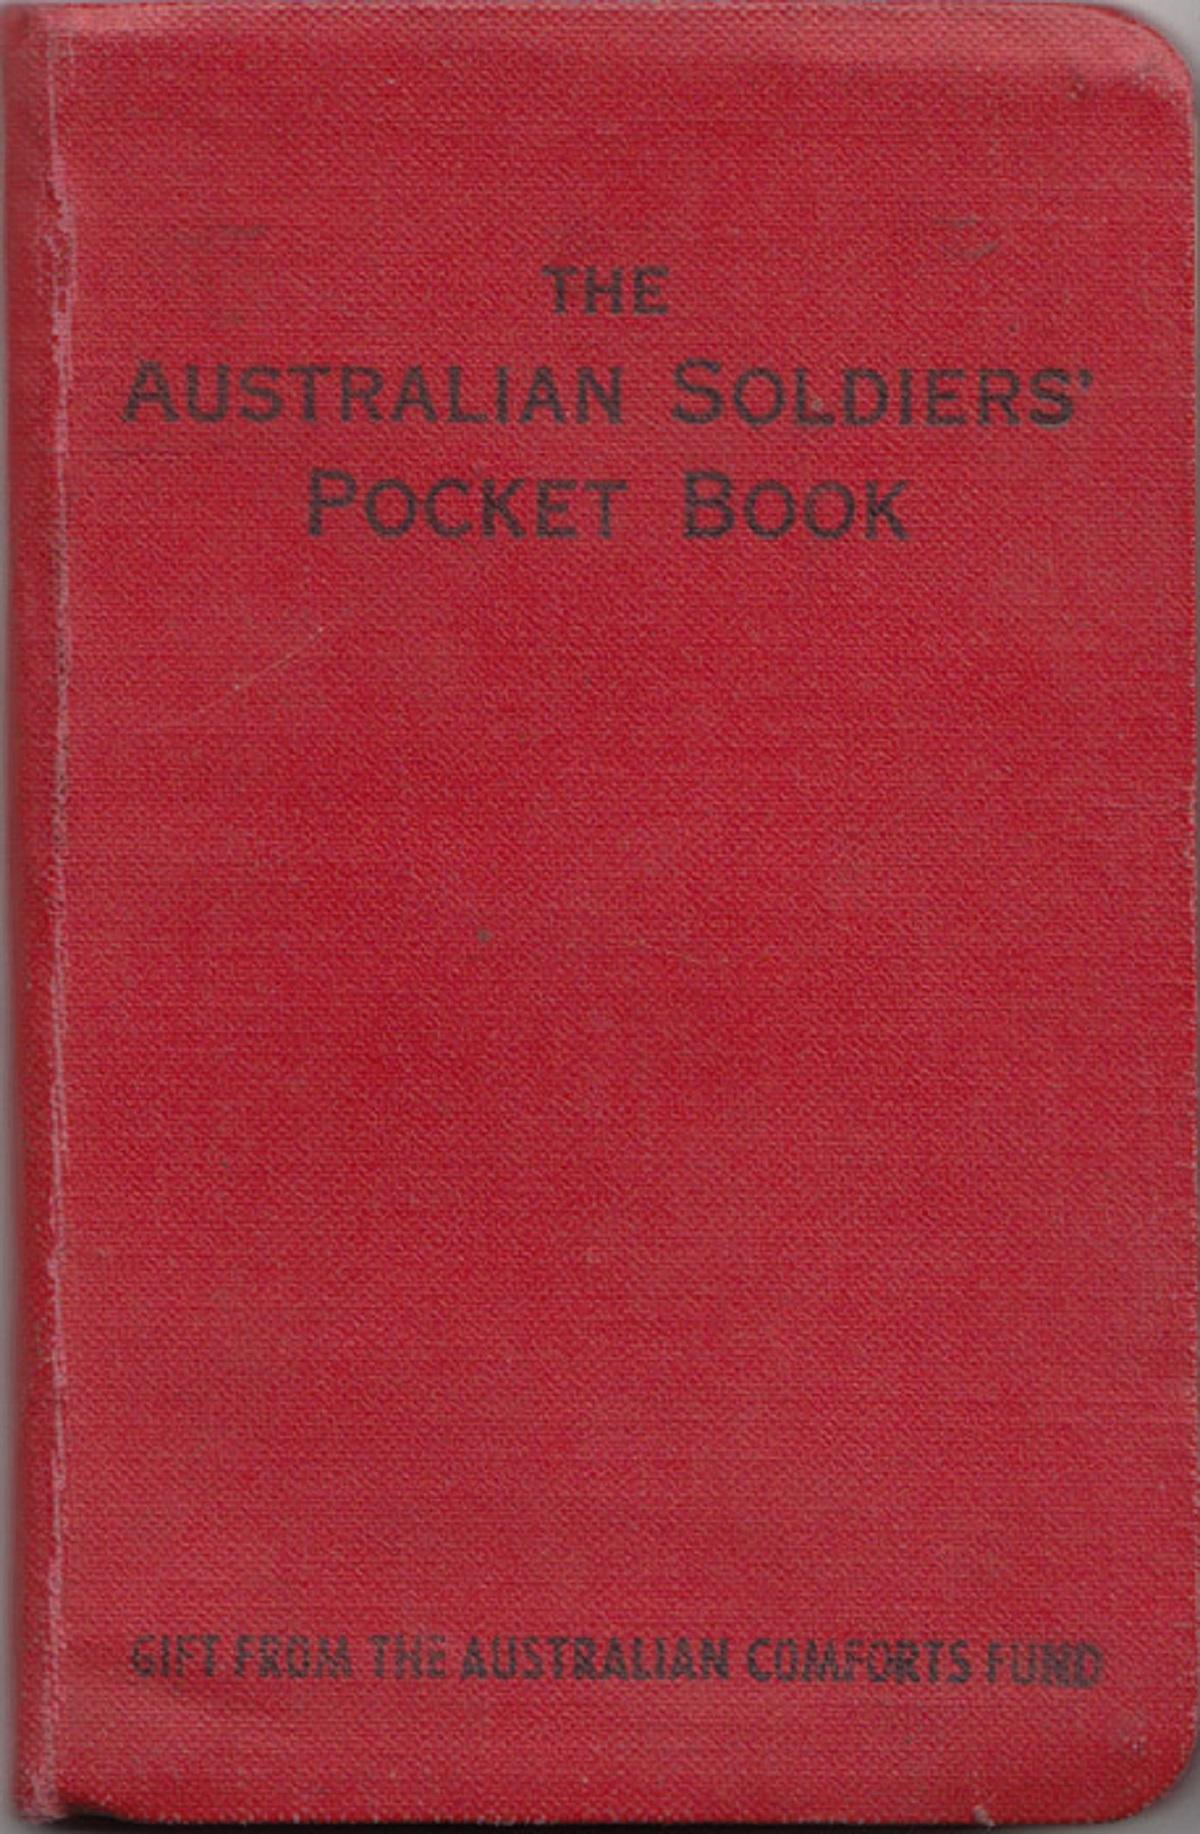 WWII. Australian Soldiers' Pocket Book, 1943, Very Fine